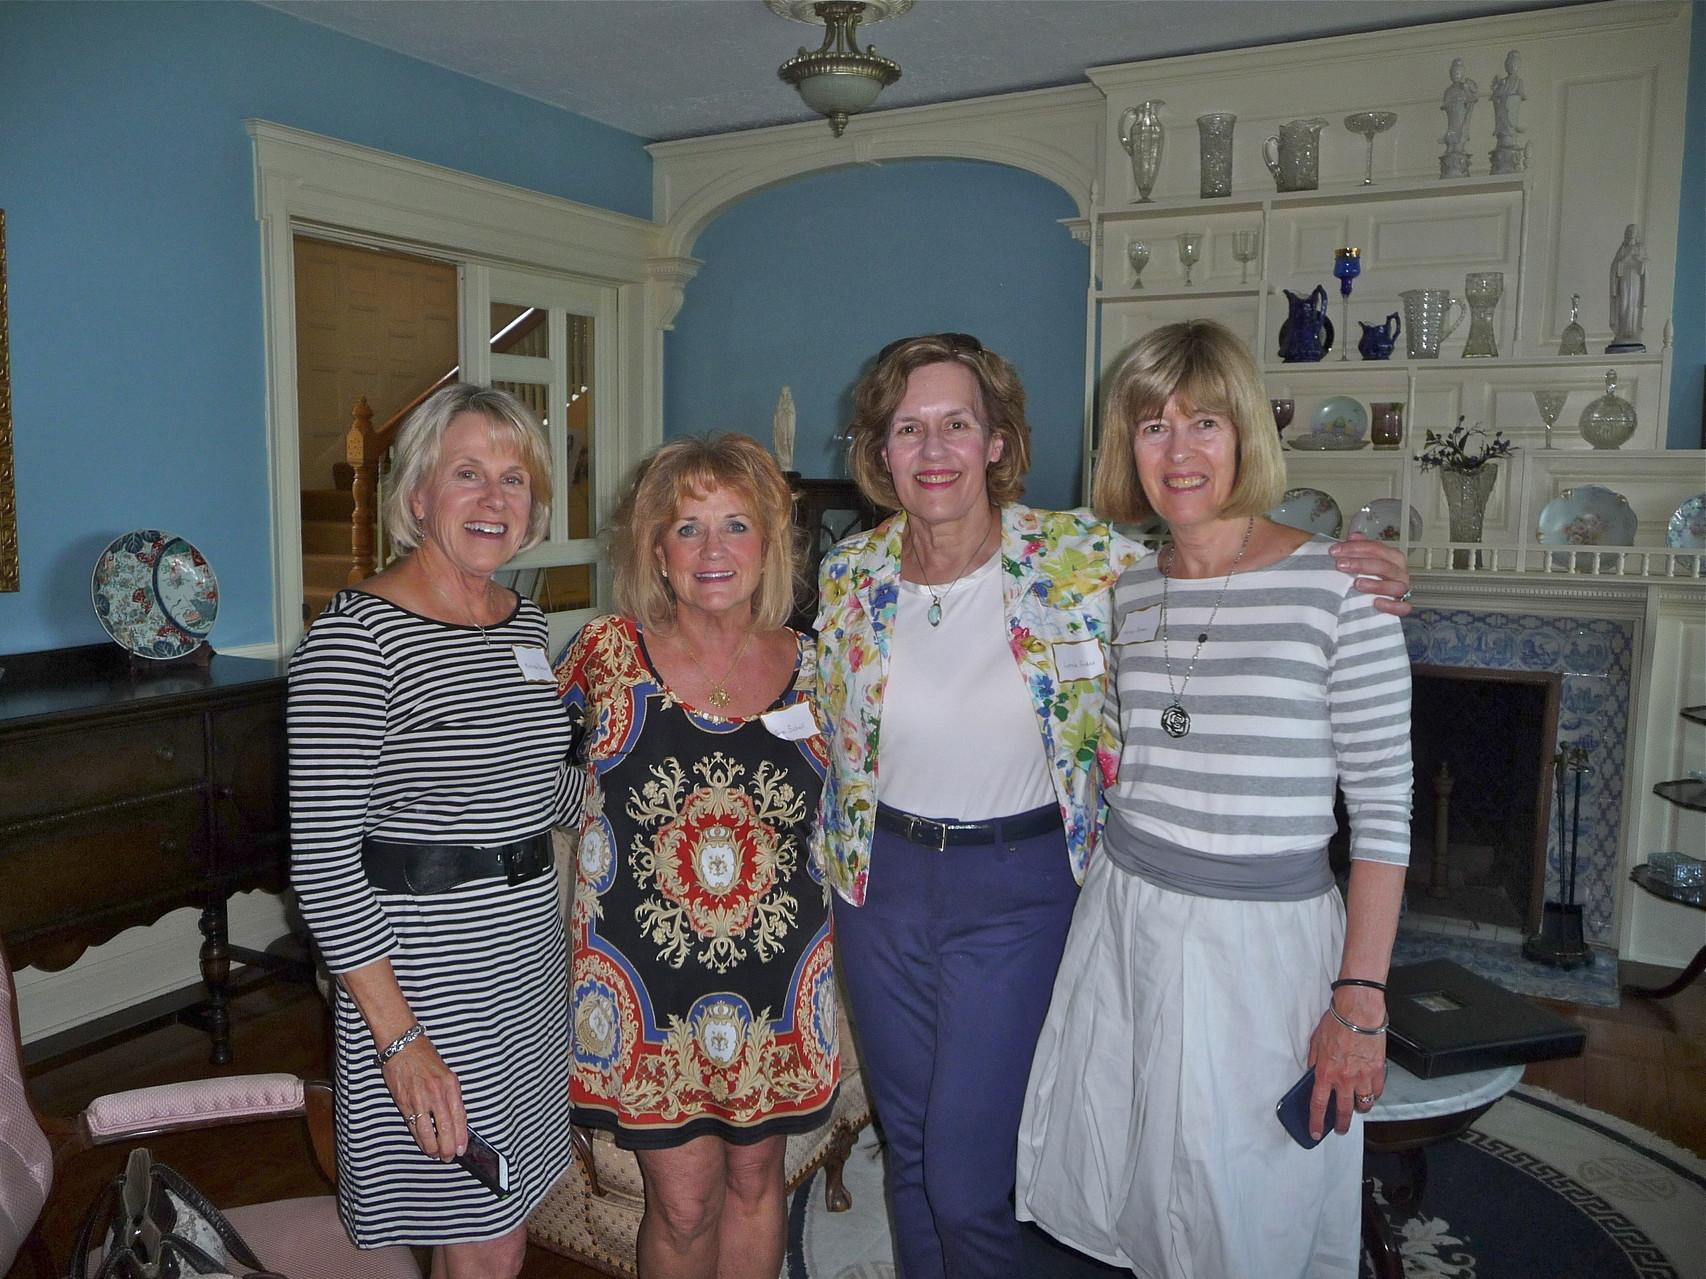 Melinda Bowser, Suzi Schall, Lorrie Gudas, Nancy Hynes